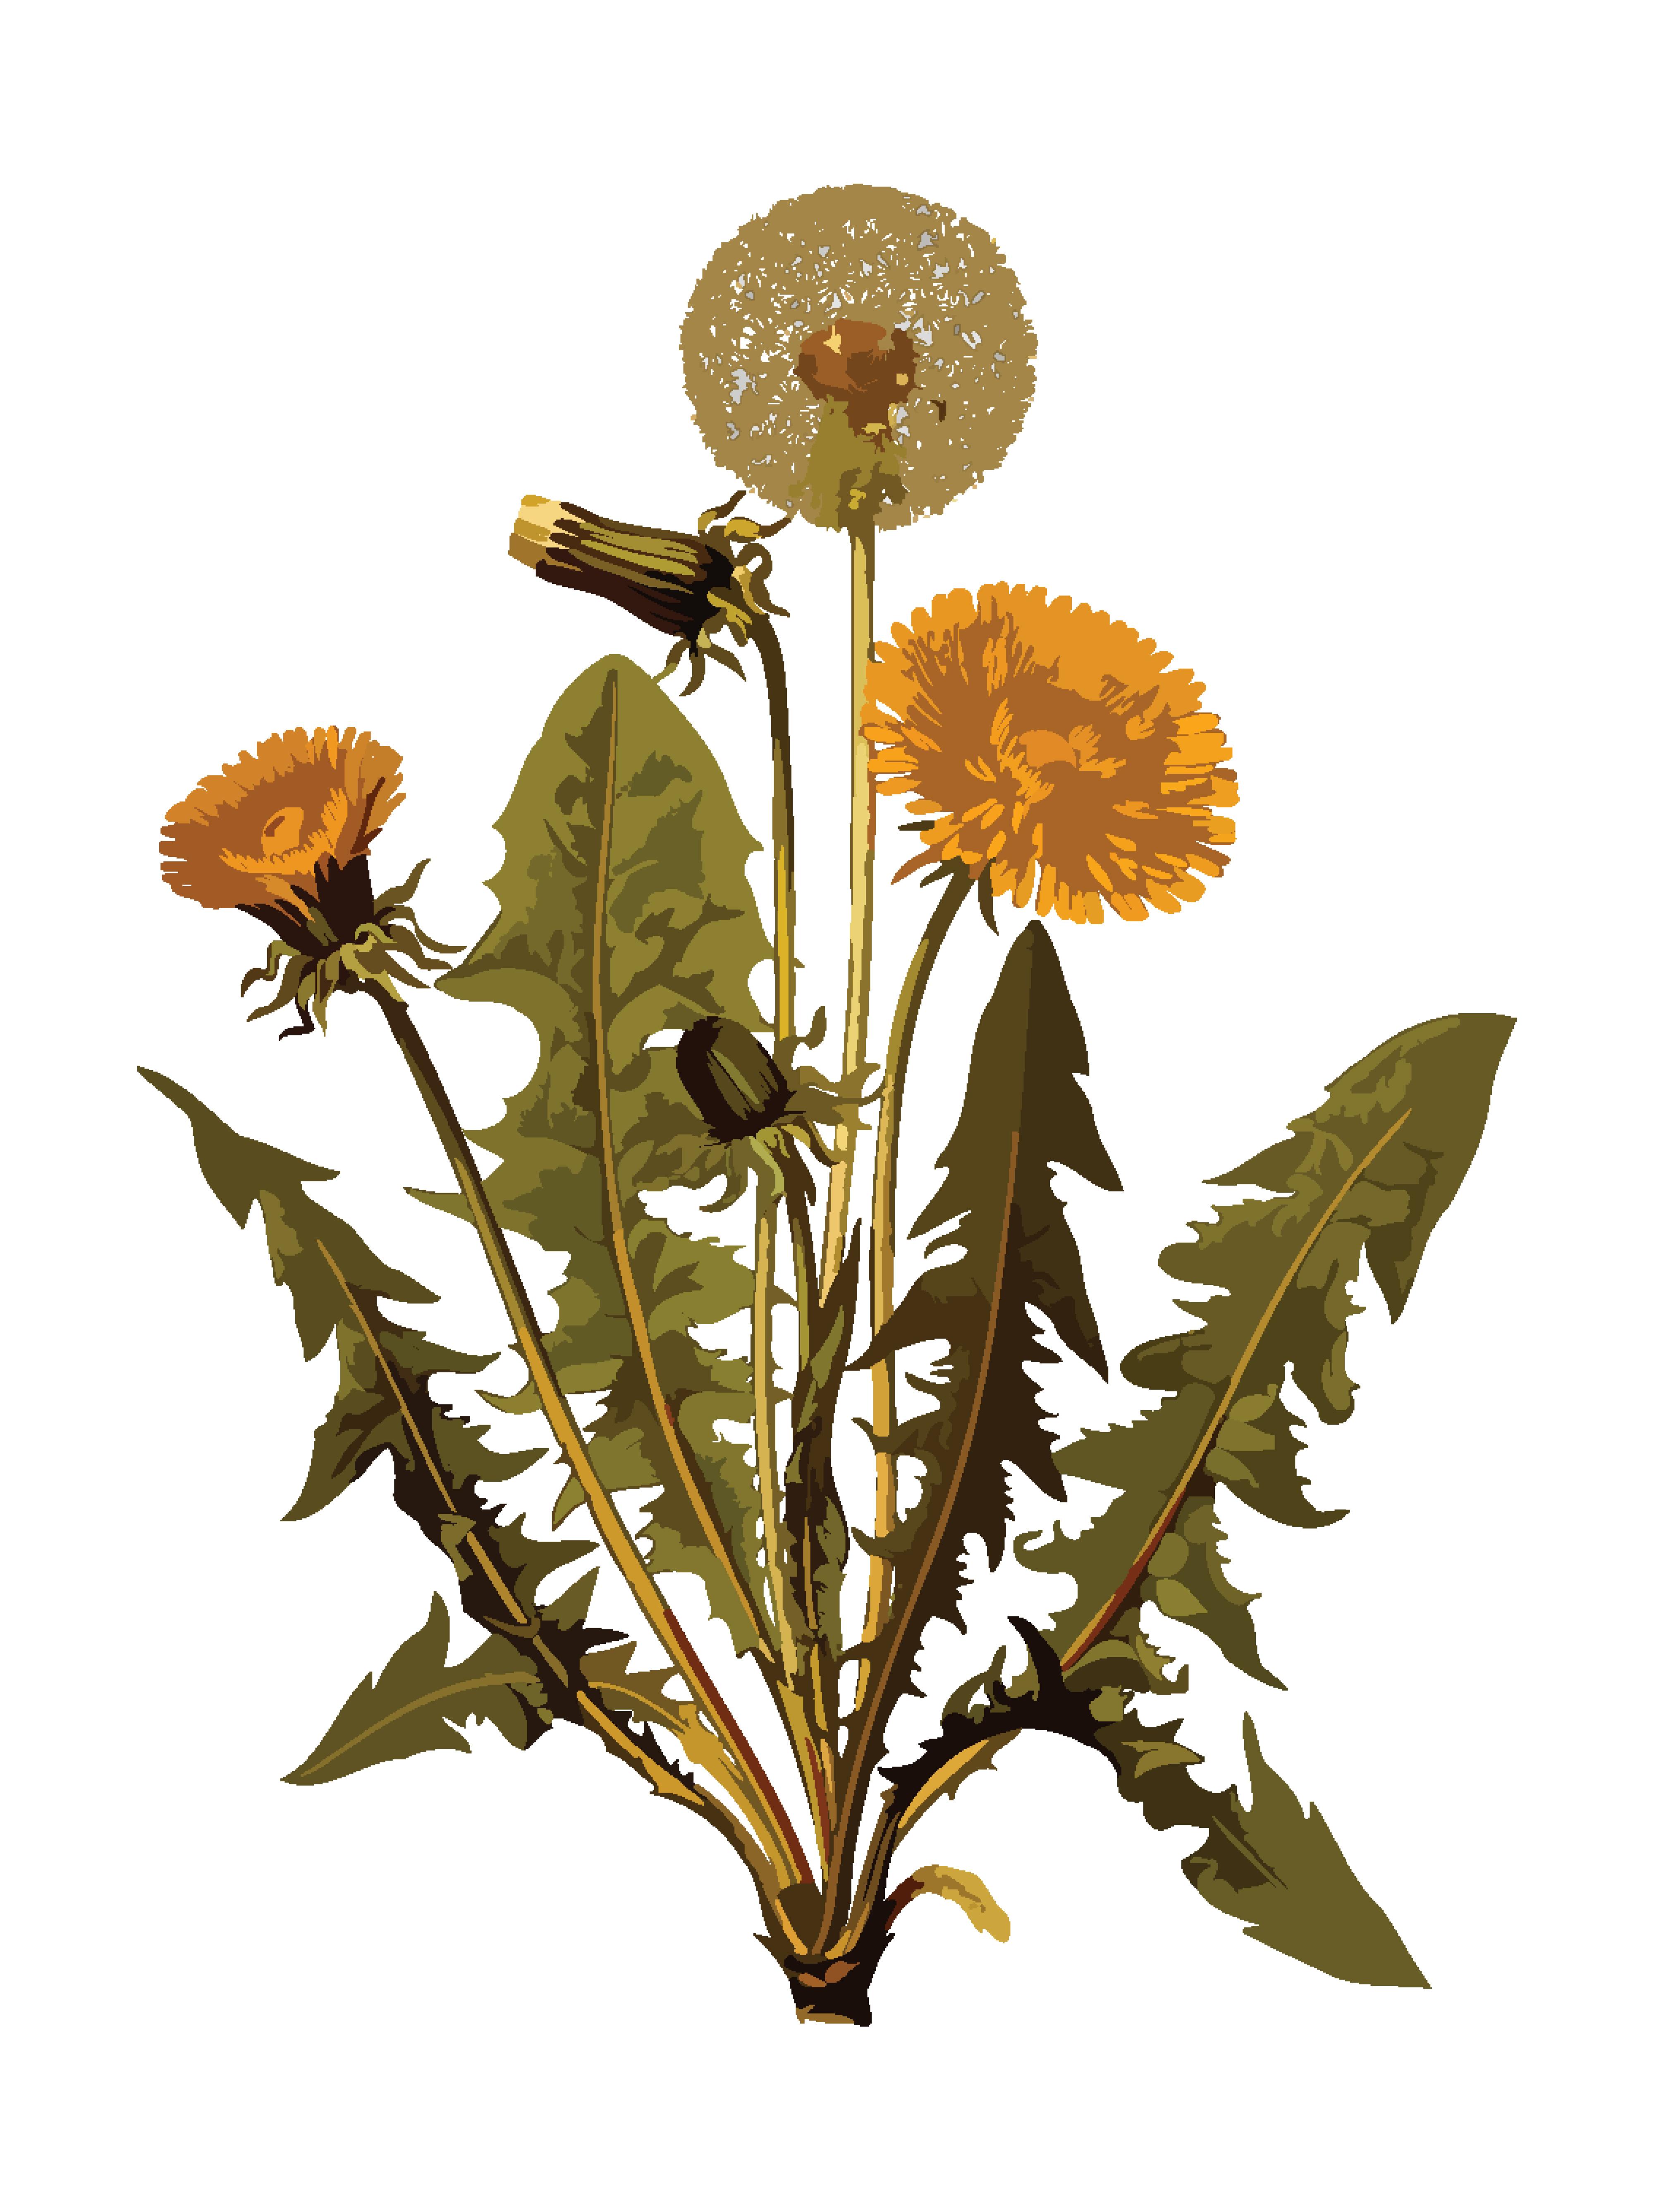 Free Clipart Of A dandelion plant.